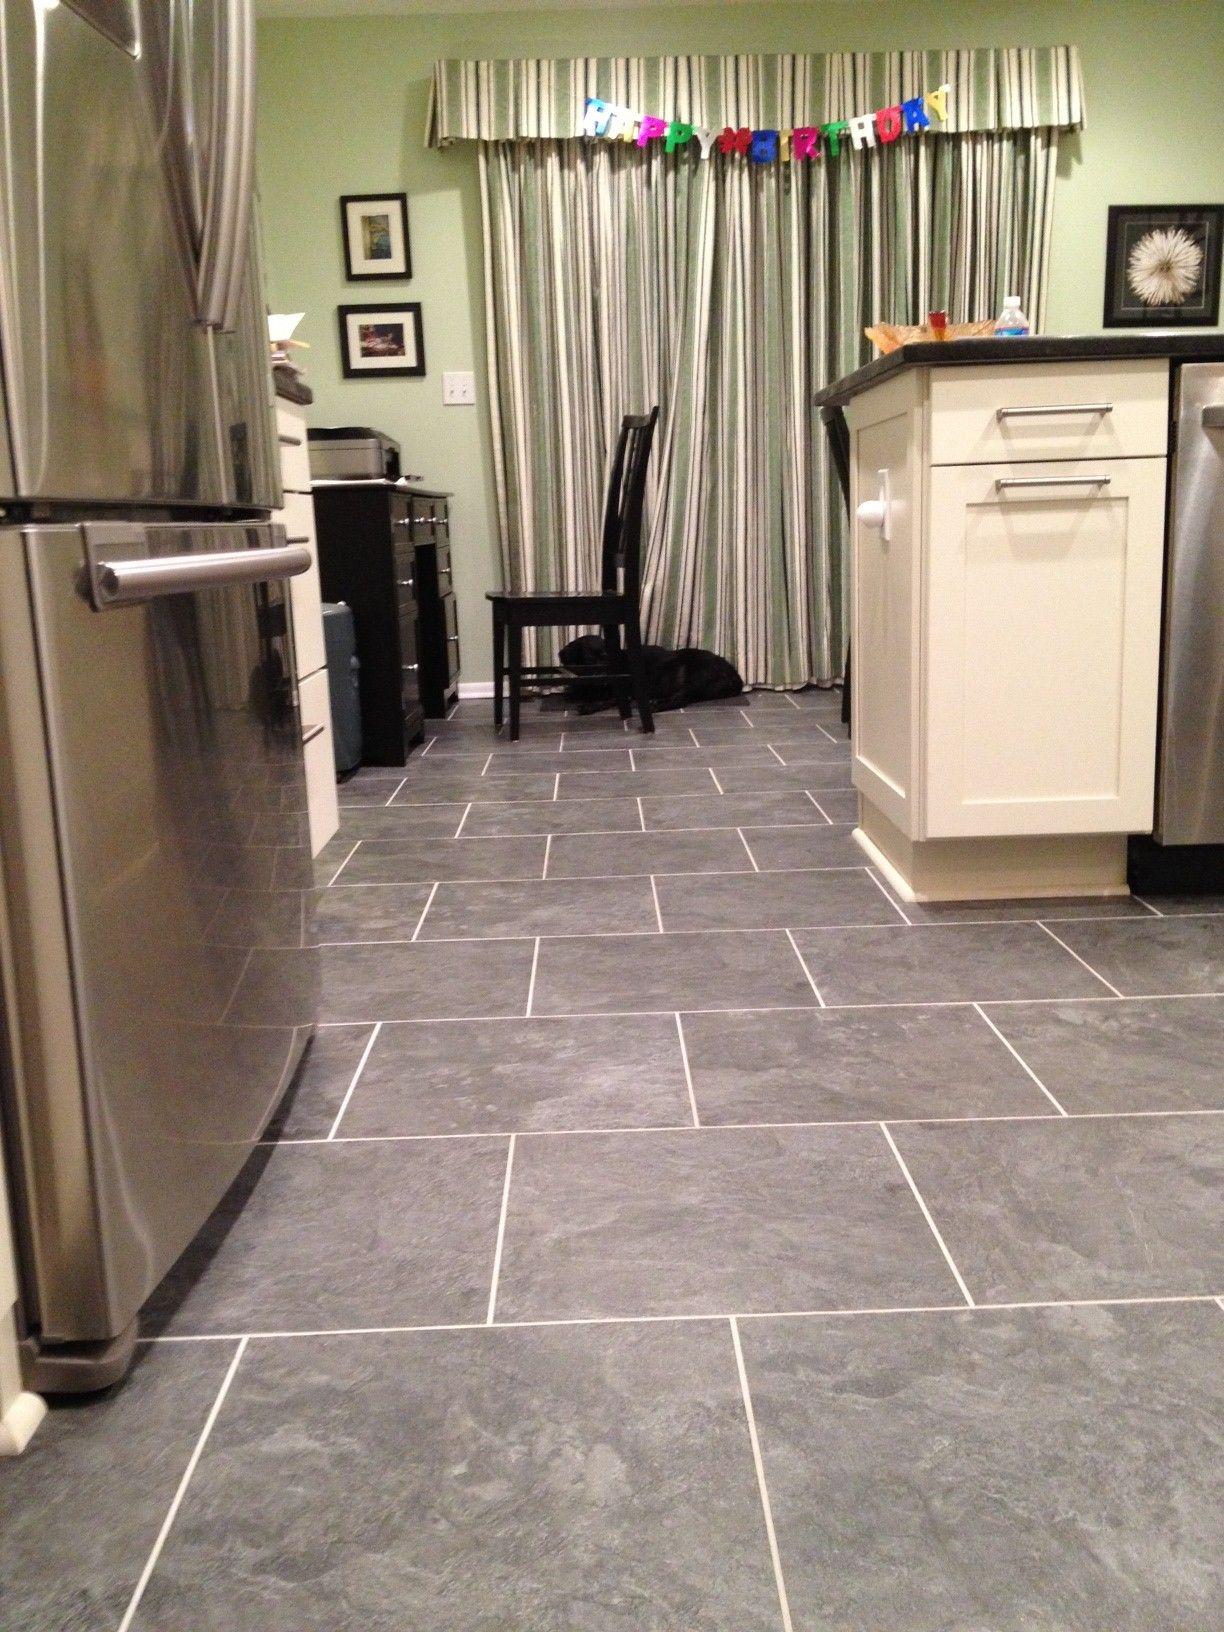 Alterna Mesa Stone Charcoal Flooring Guest Bathroom Tile Floor